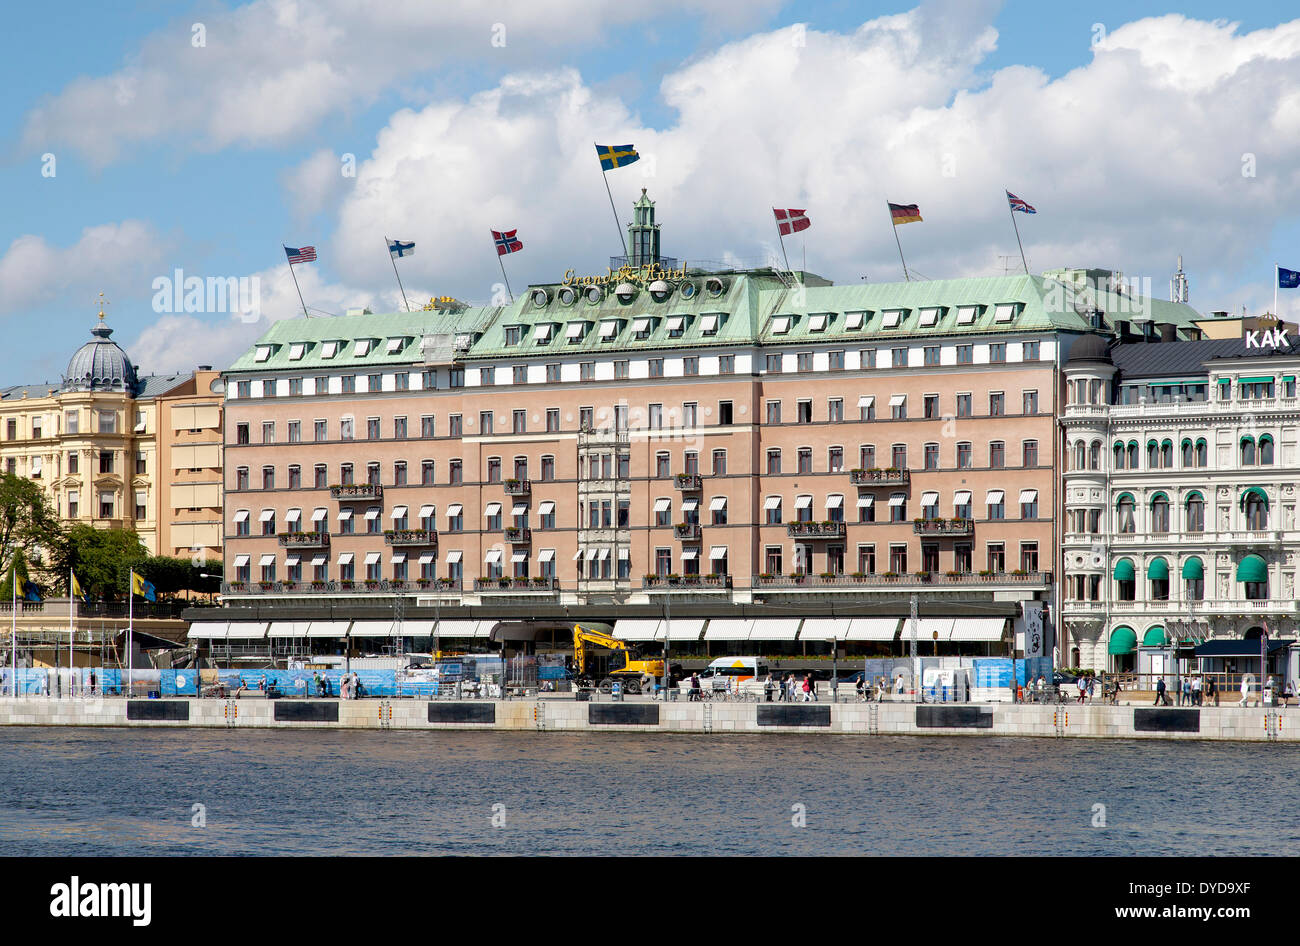 Grand Hotel, Södra Blasieholmshamnen, Stockholm, Stockholms län or Stockholm County, Sweden - Stock Image